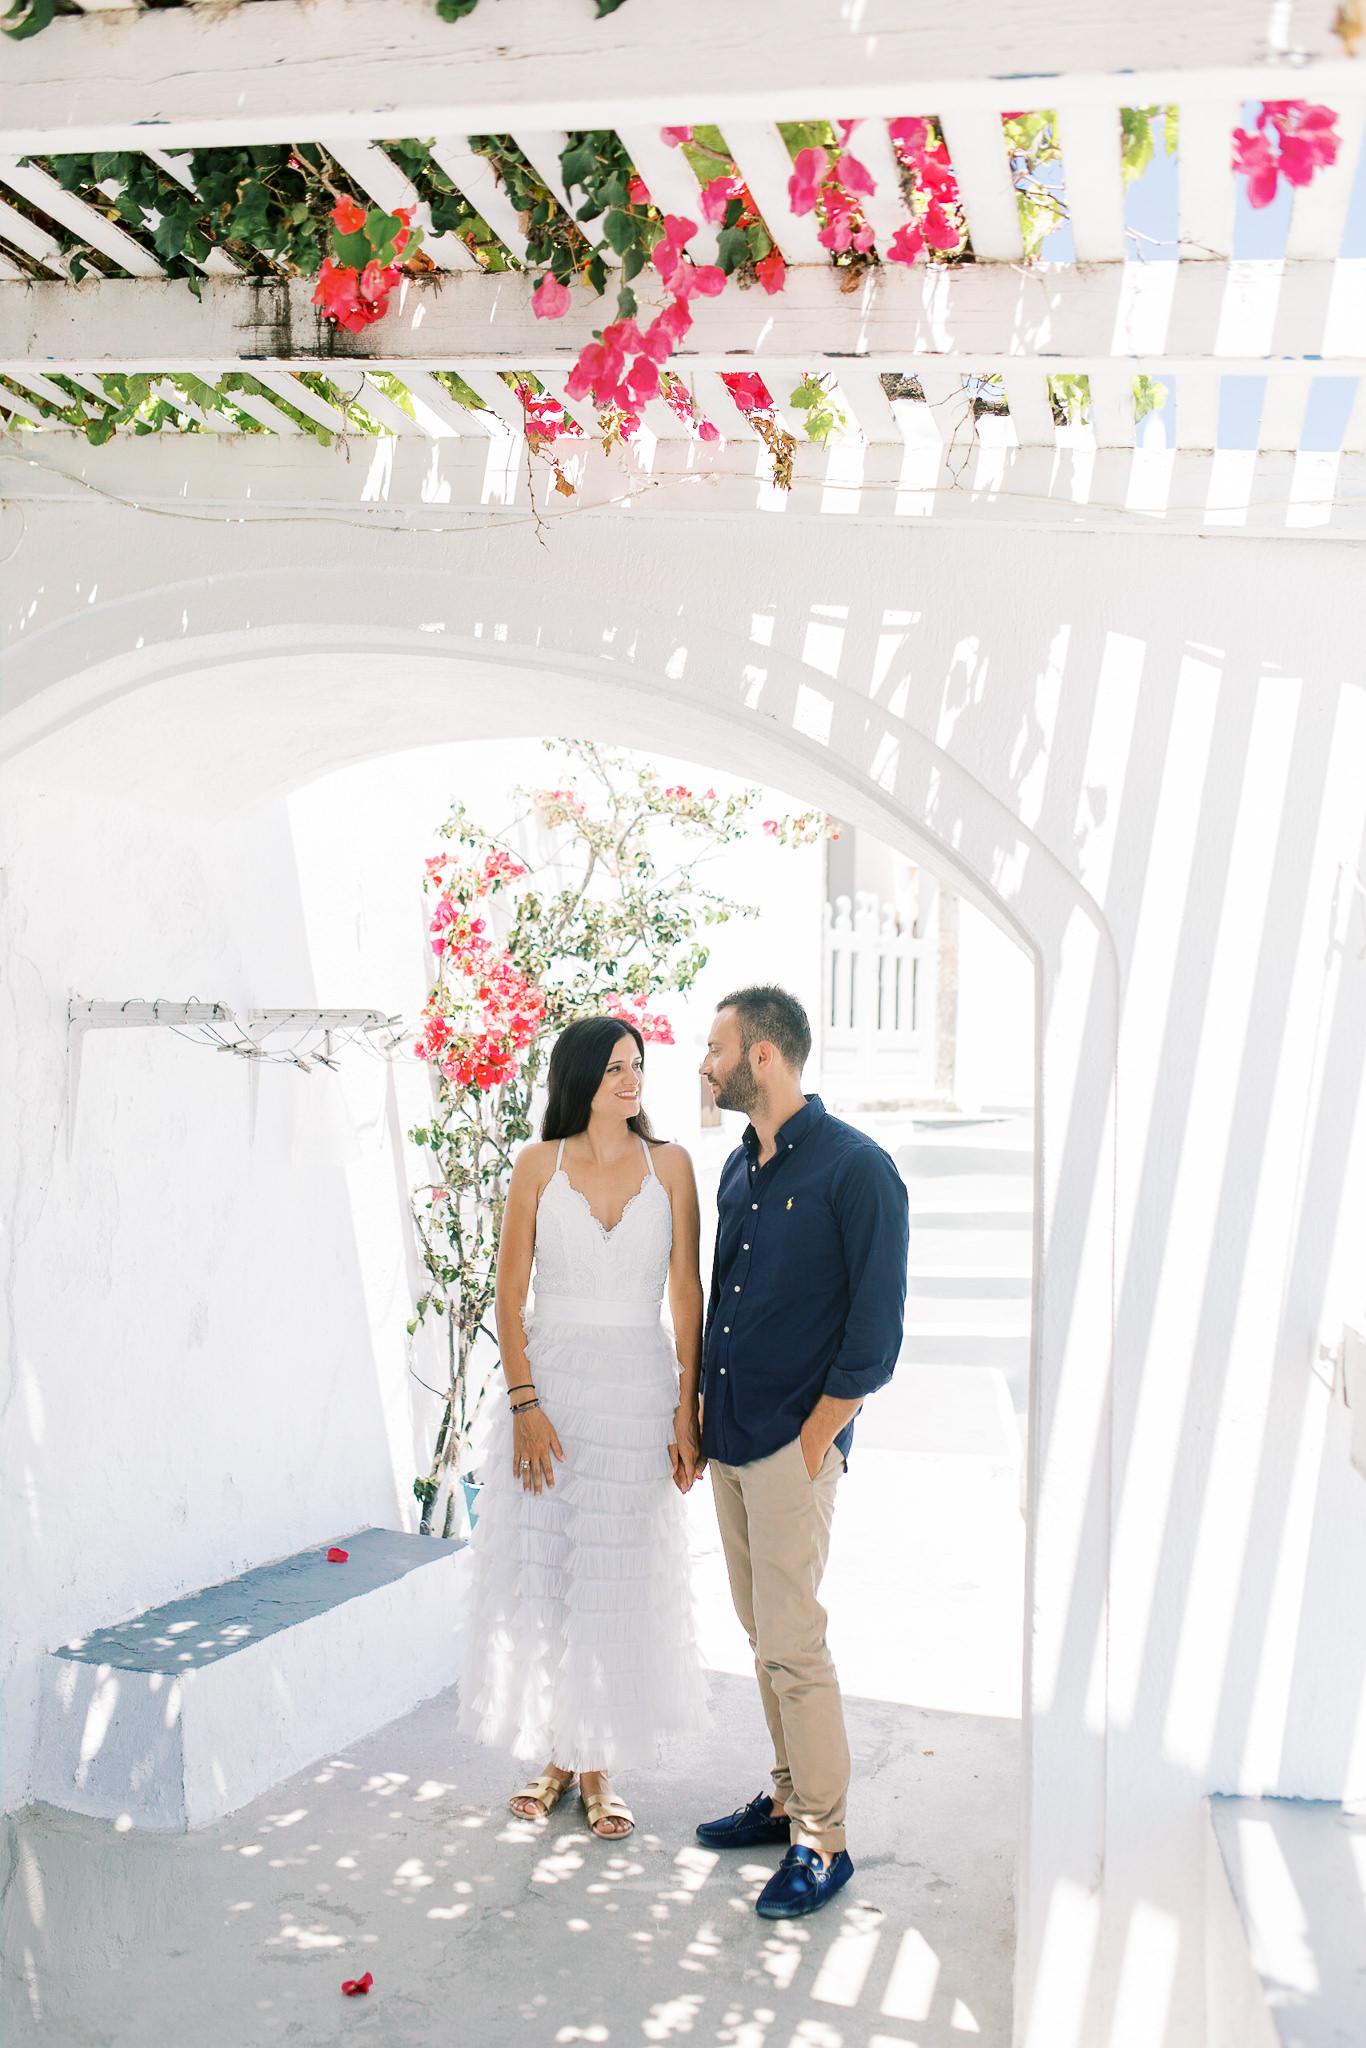 Argiris & Dimitra